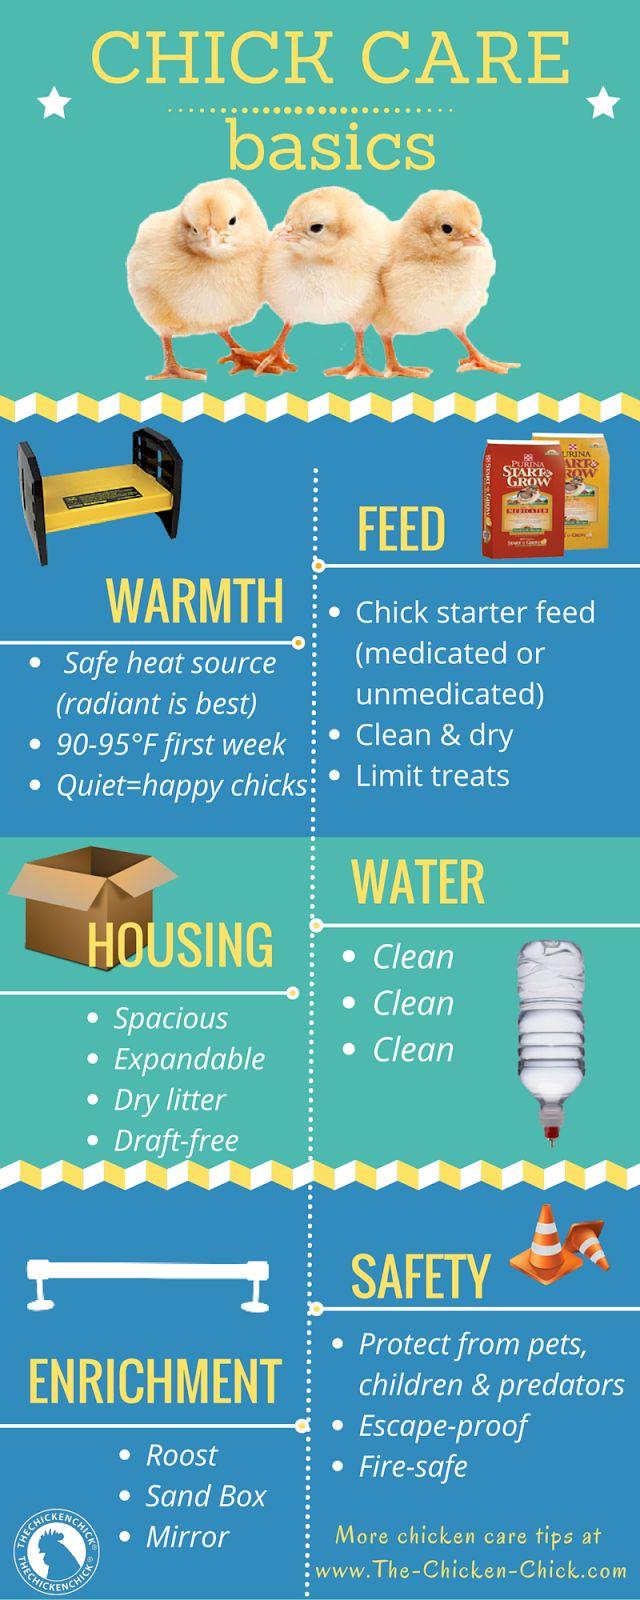 Chick Care Basics www.The-Chicken-Chick.com